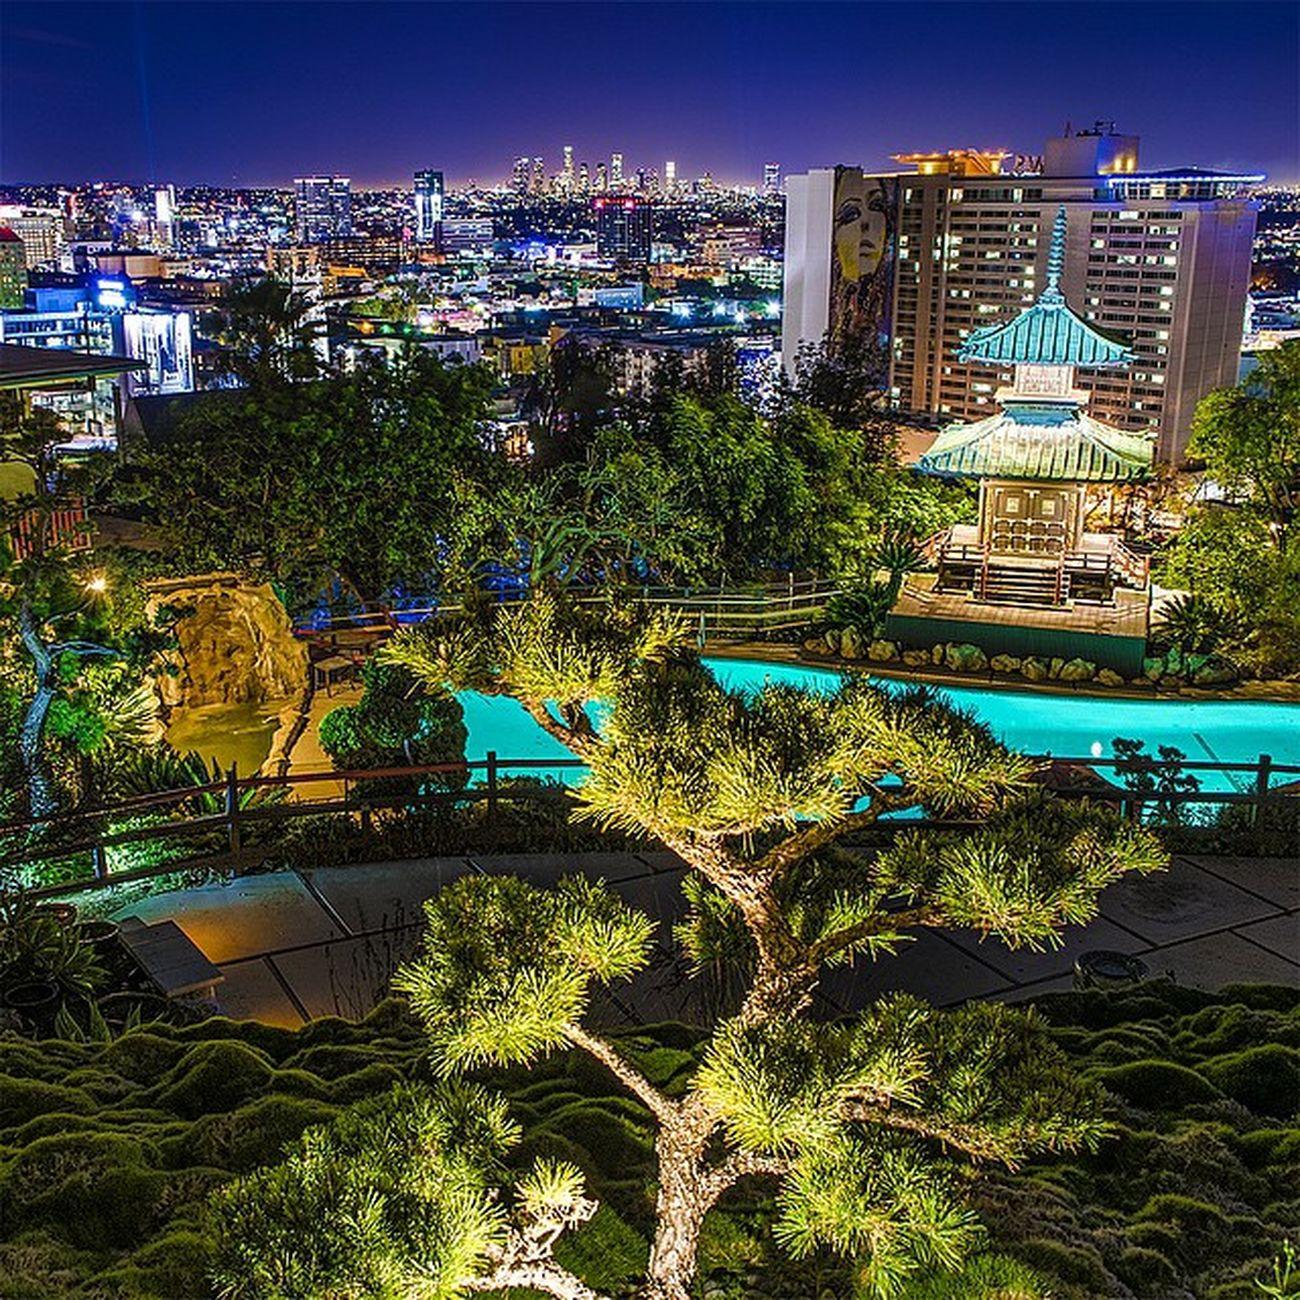 Cities At Night Long Exposures Long Exposure Los Angeles, California TurnUpTheBrightness Los Angeles Life Losangeles_la DiscoverLA Yamashirola Yamashiro